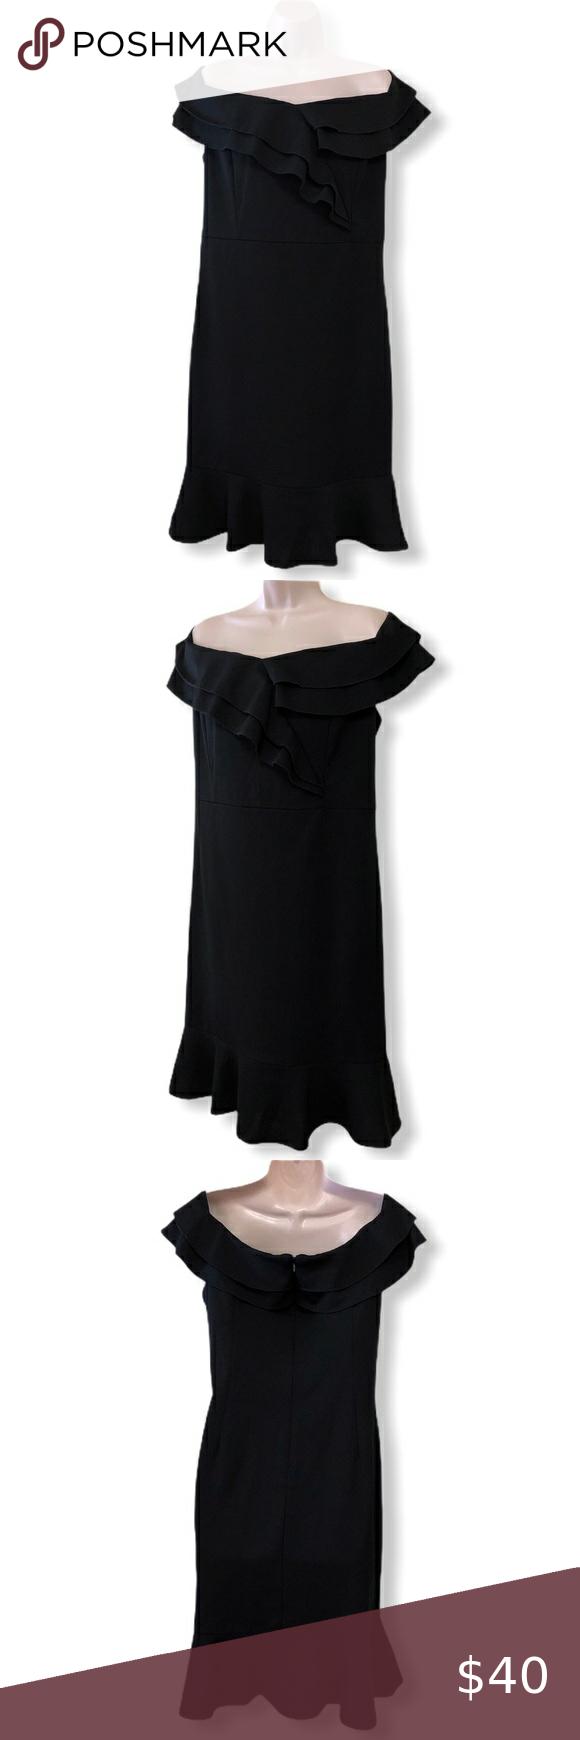 Ile Black Off The Shoulder Ruffle Dress Black Faux Leather Dress Shoulder Ruffle Dress Off White Lace Dress [ 1740 x 580 Pixel ]